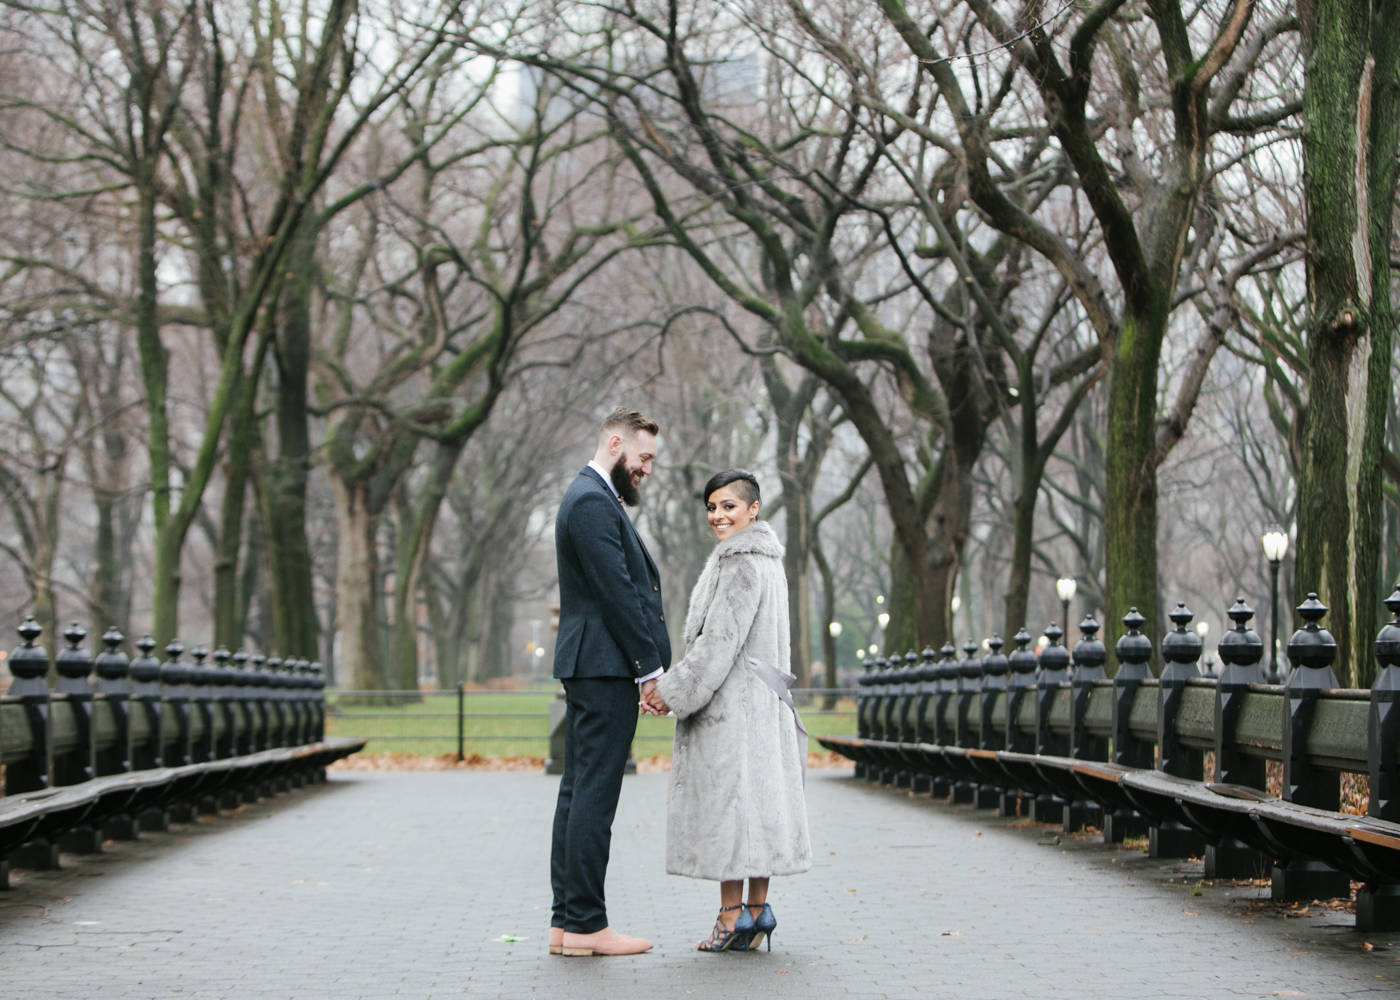 Central-park-wedding-by-Tanya-Isaeva-111.jpg